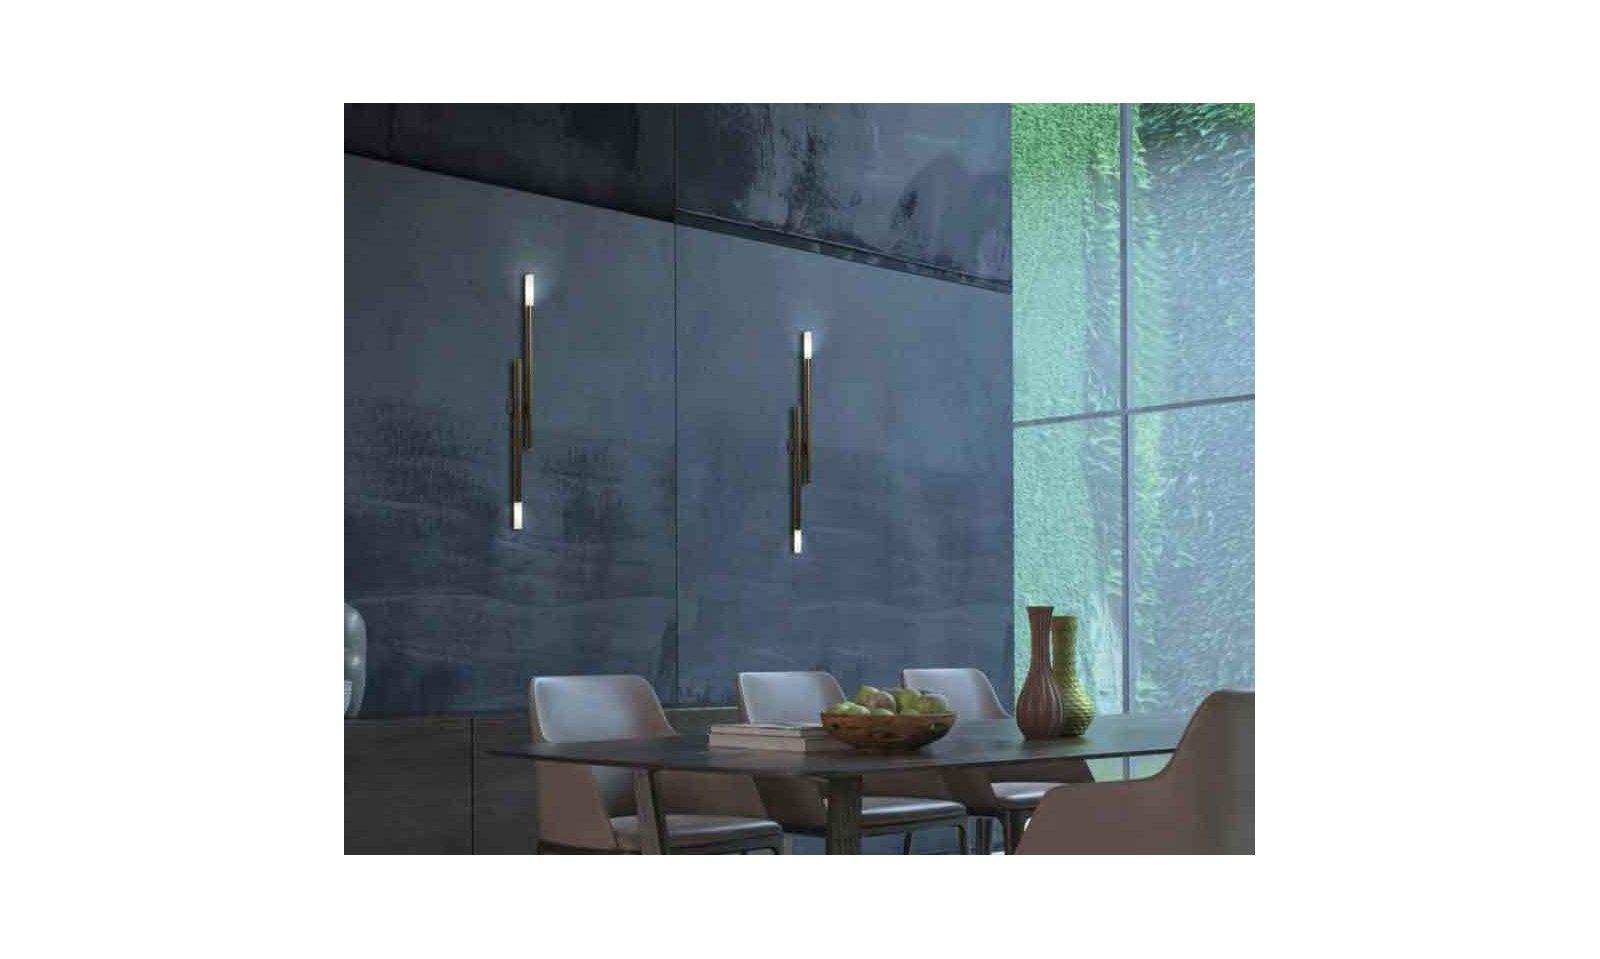 Gibas applique zen moderna lampada da parete moderna